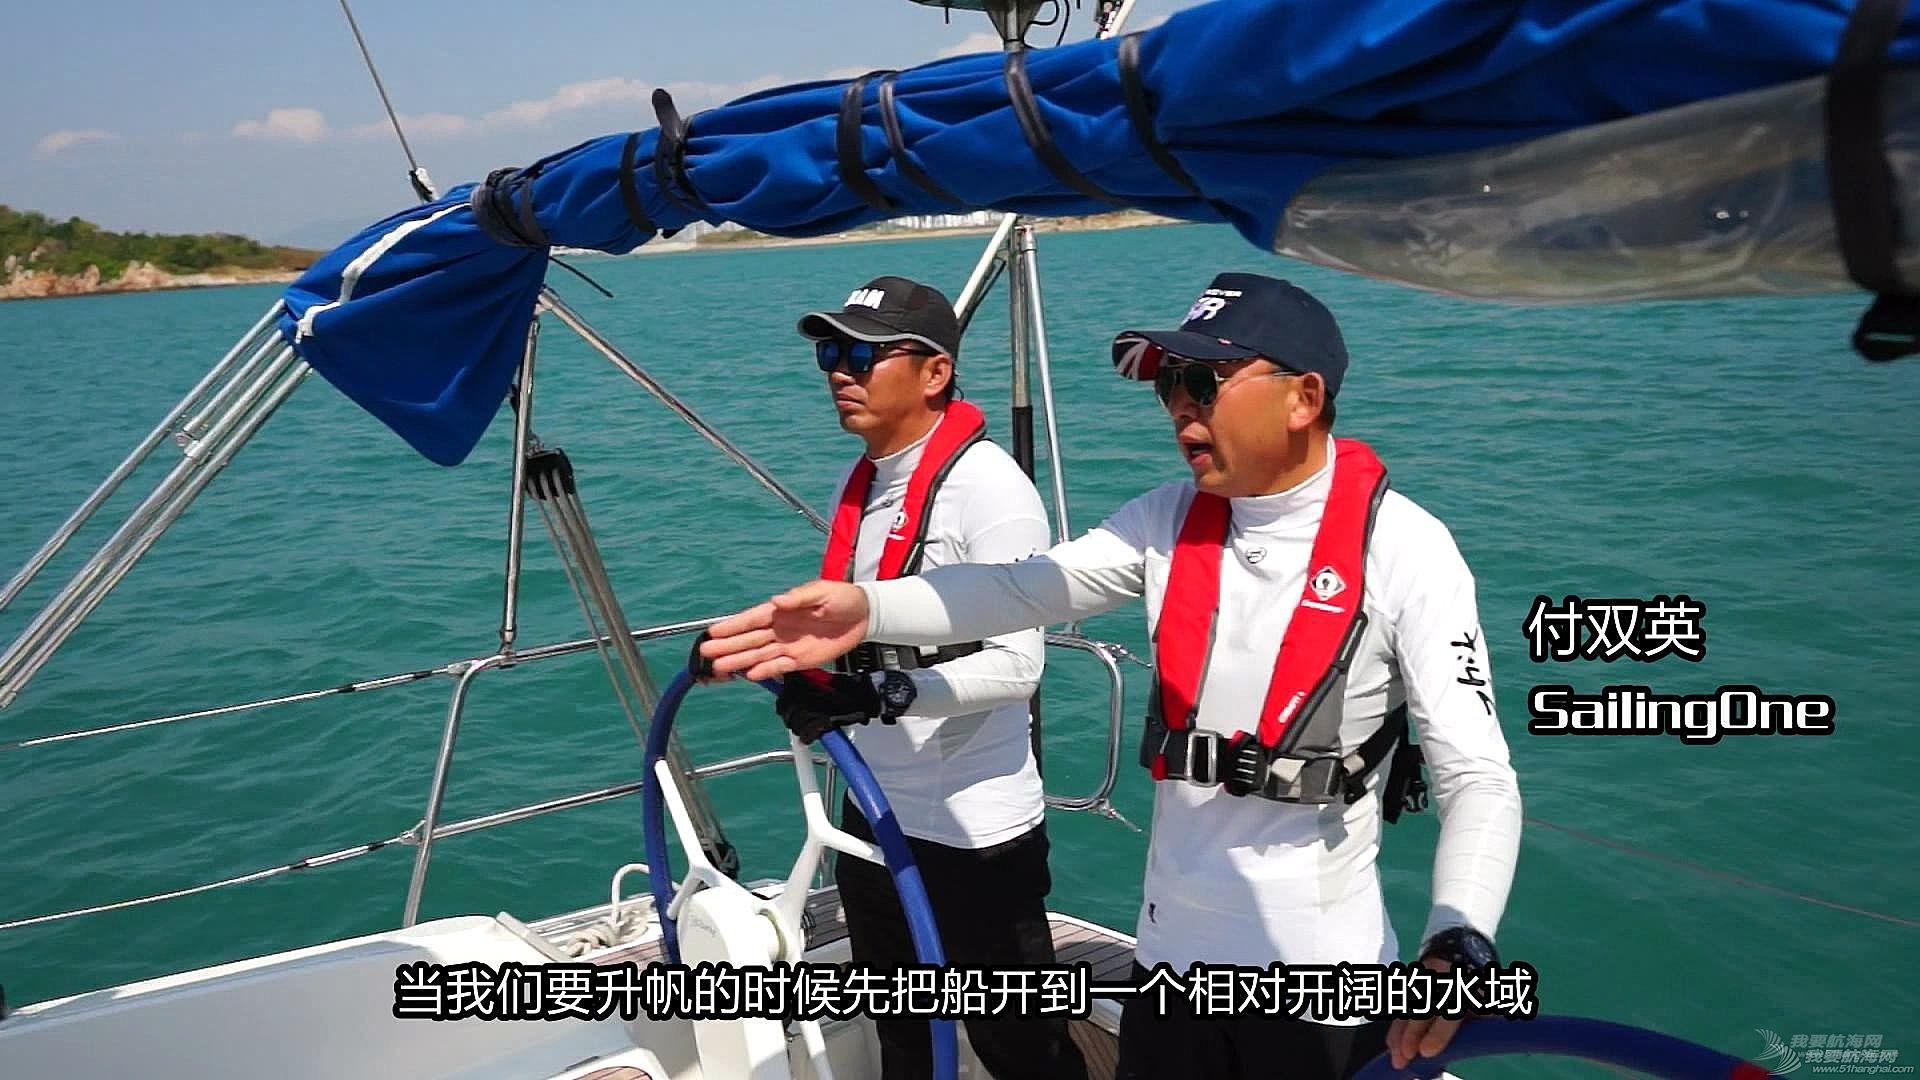 SailingOne帆船培训视频第五课《今天我们将成为舵手》